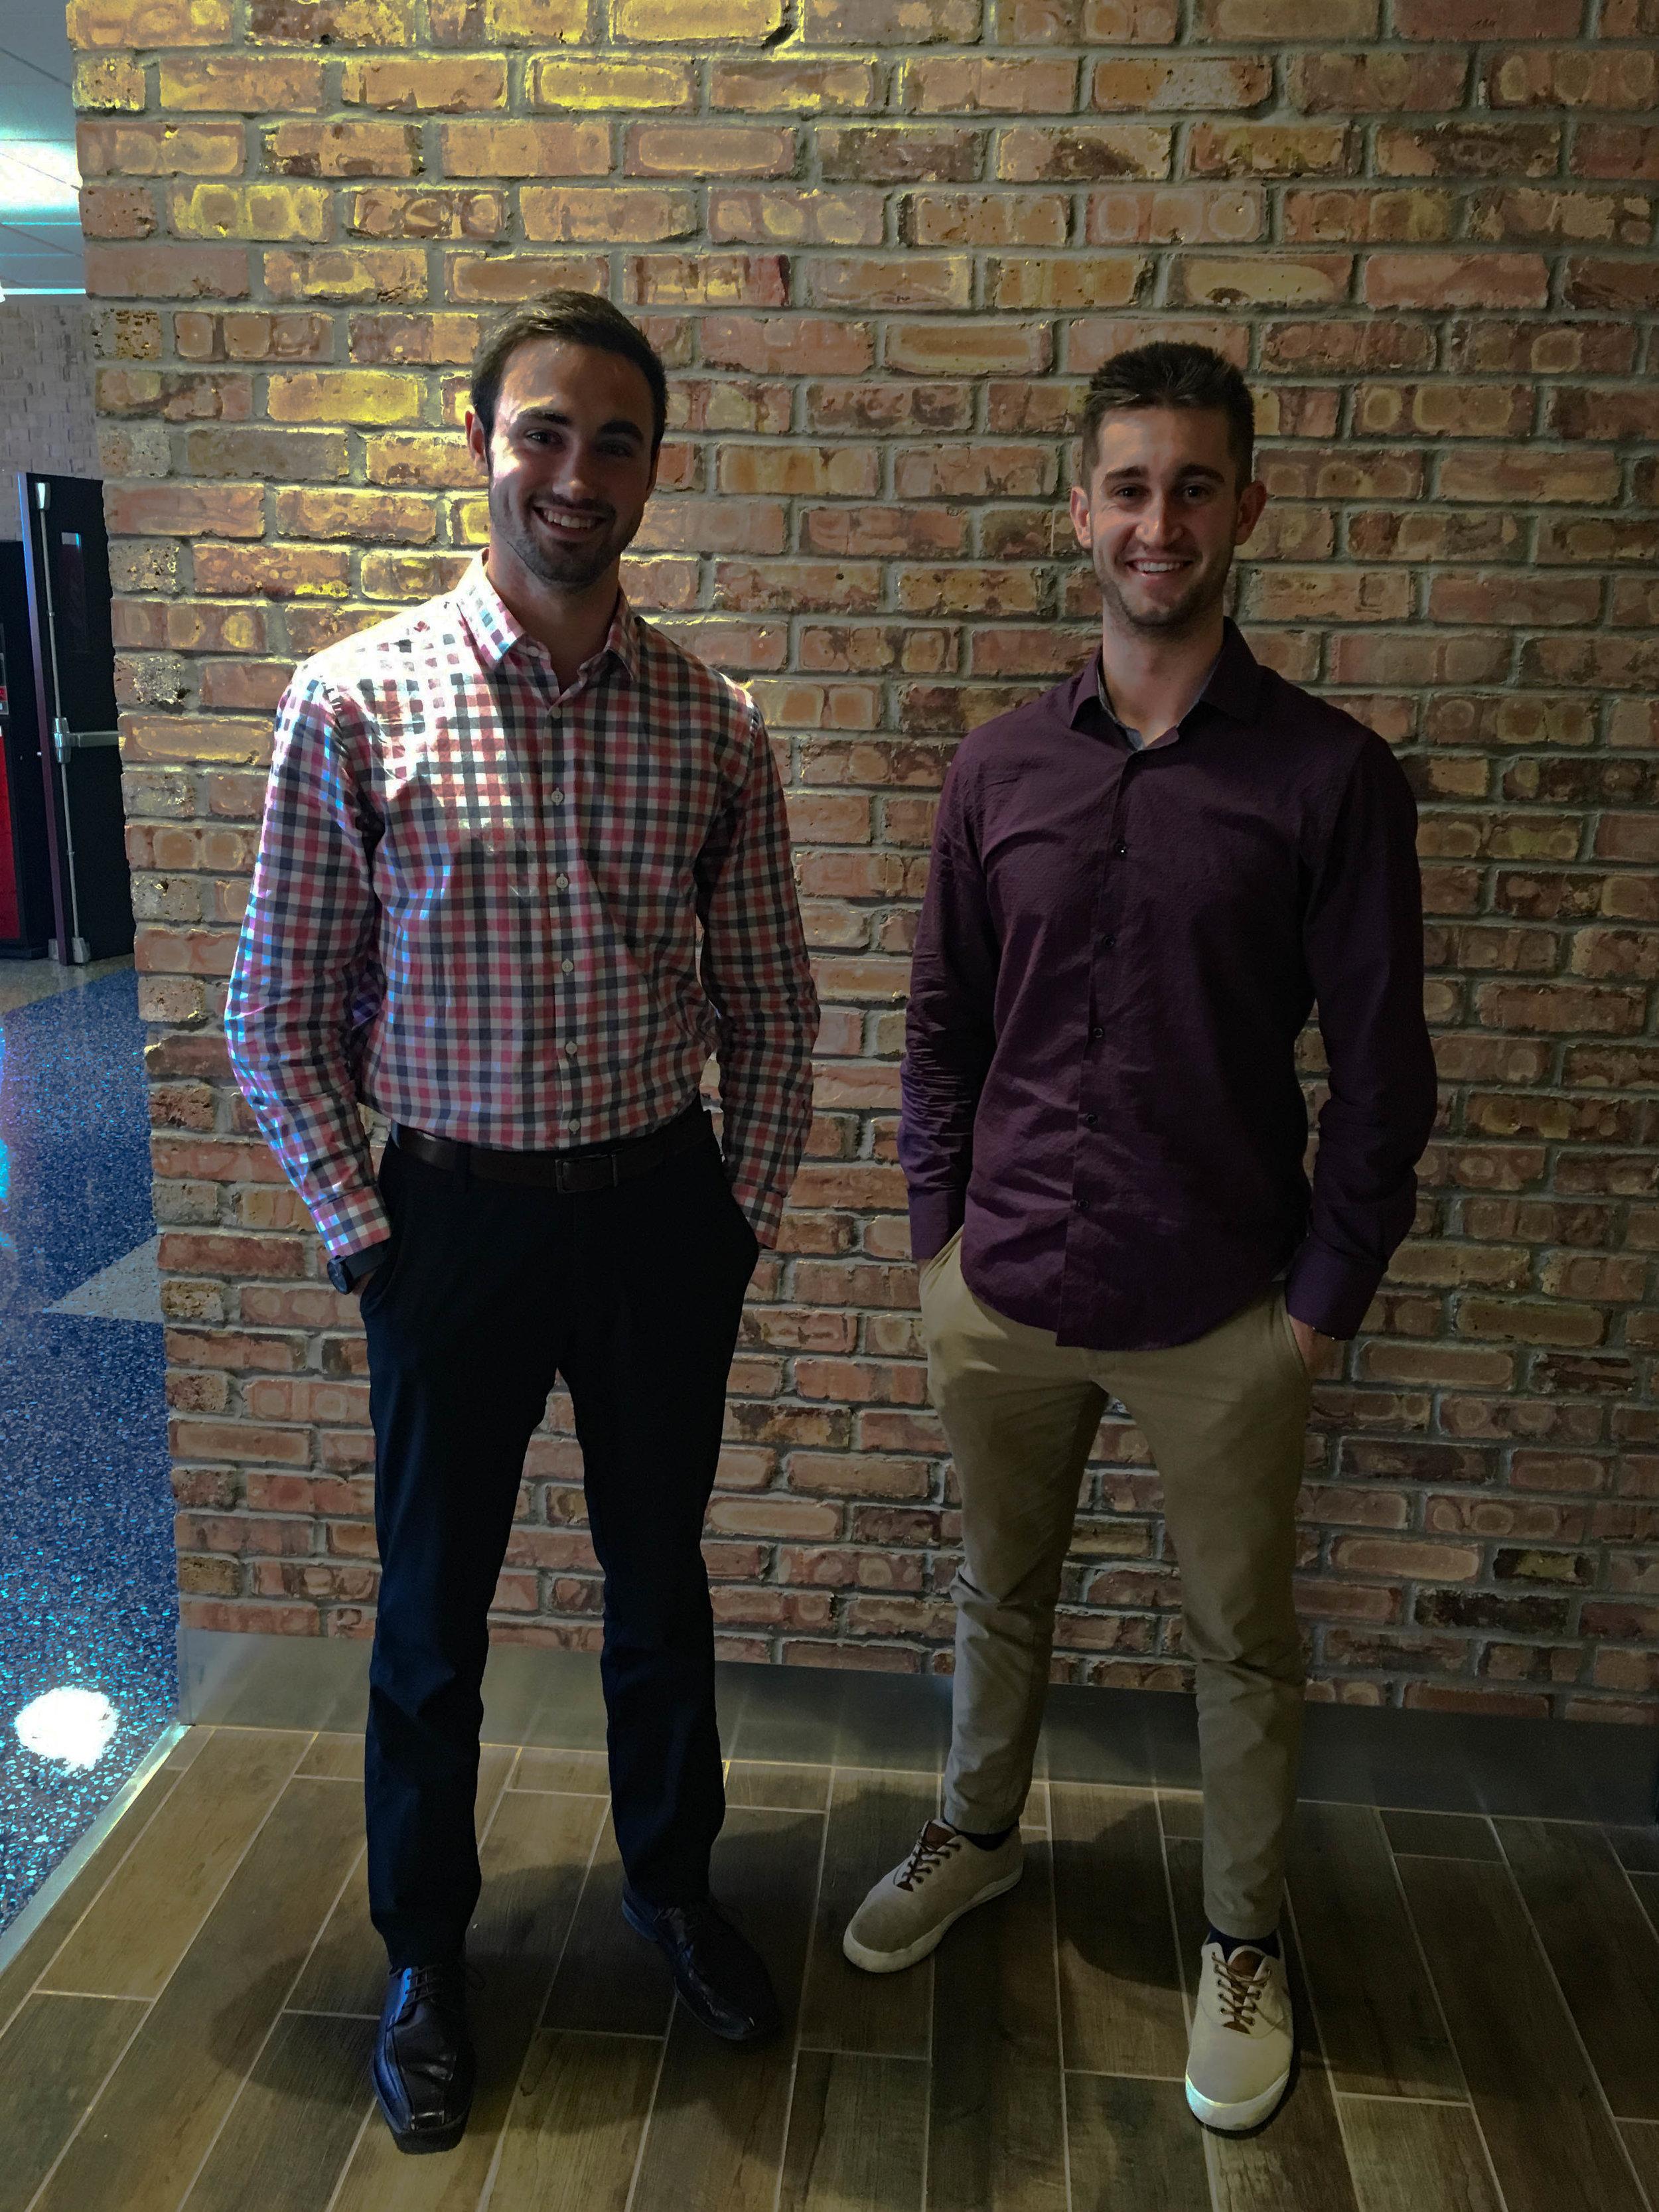 Seniors Brandon Colucci and Andrew Achter